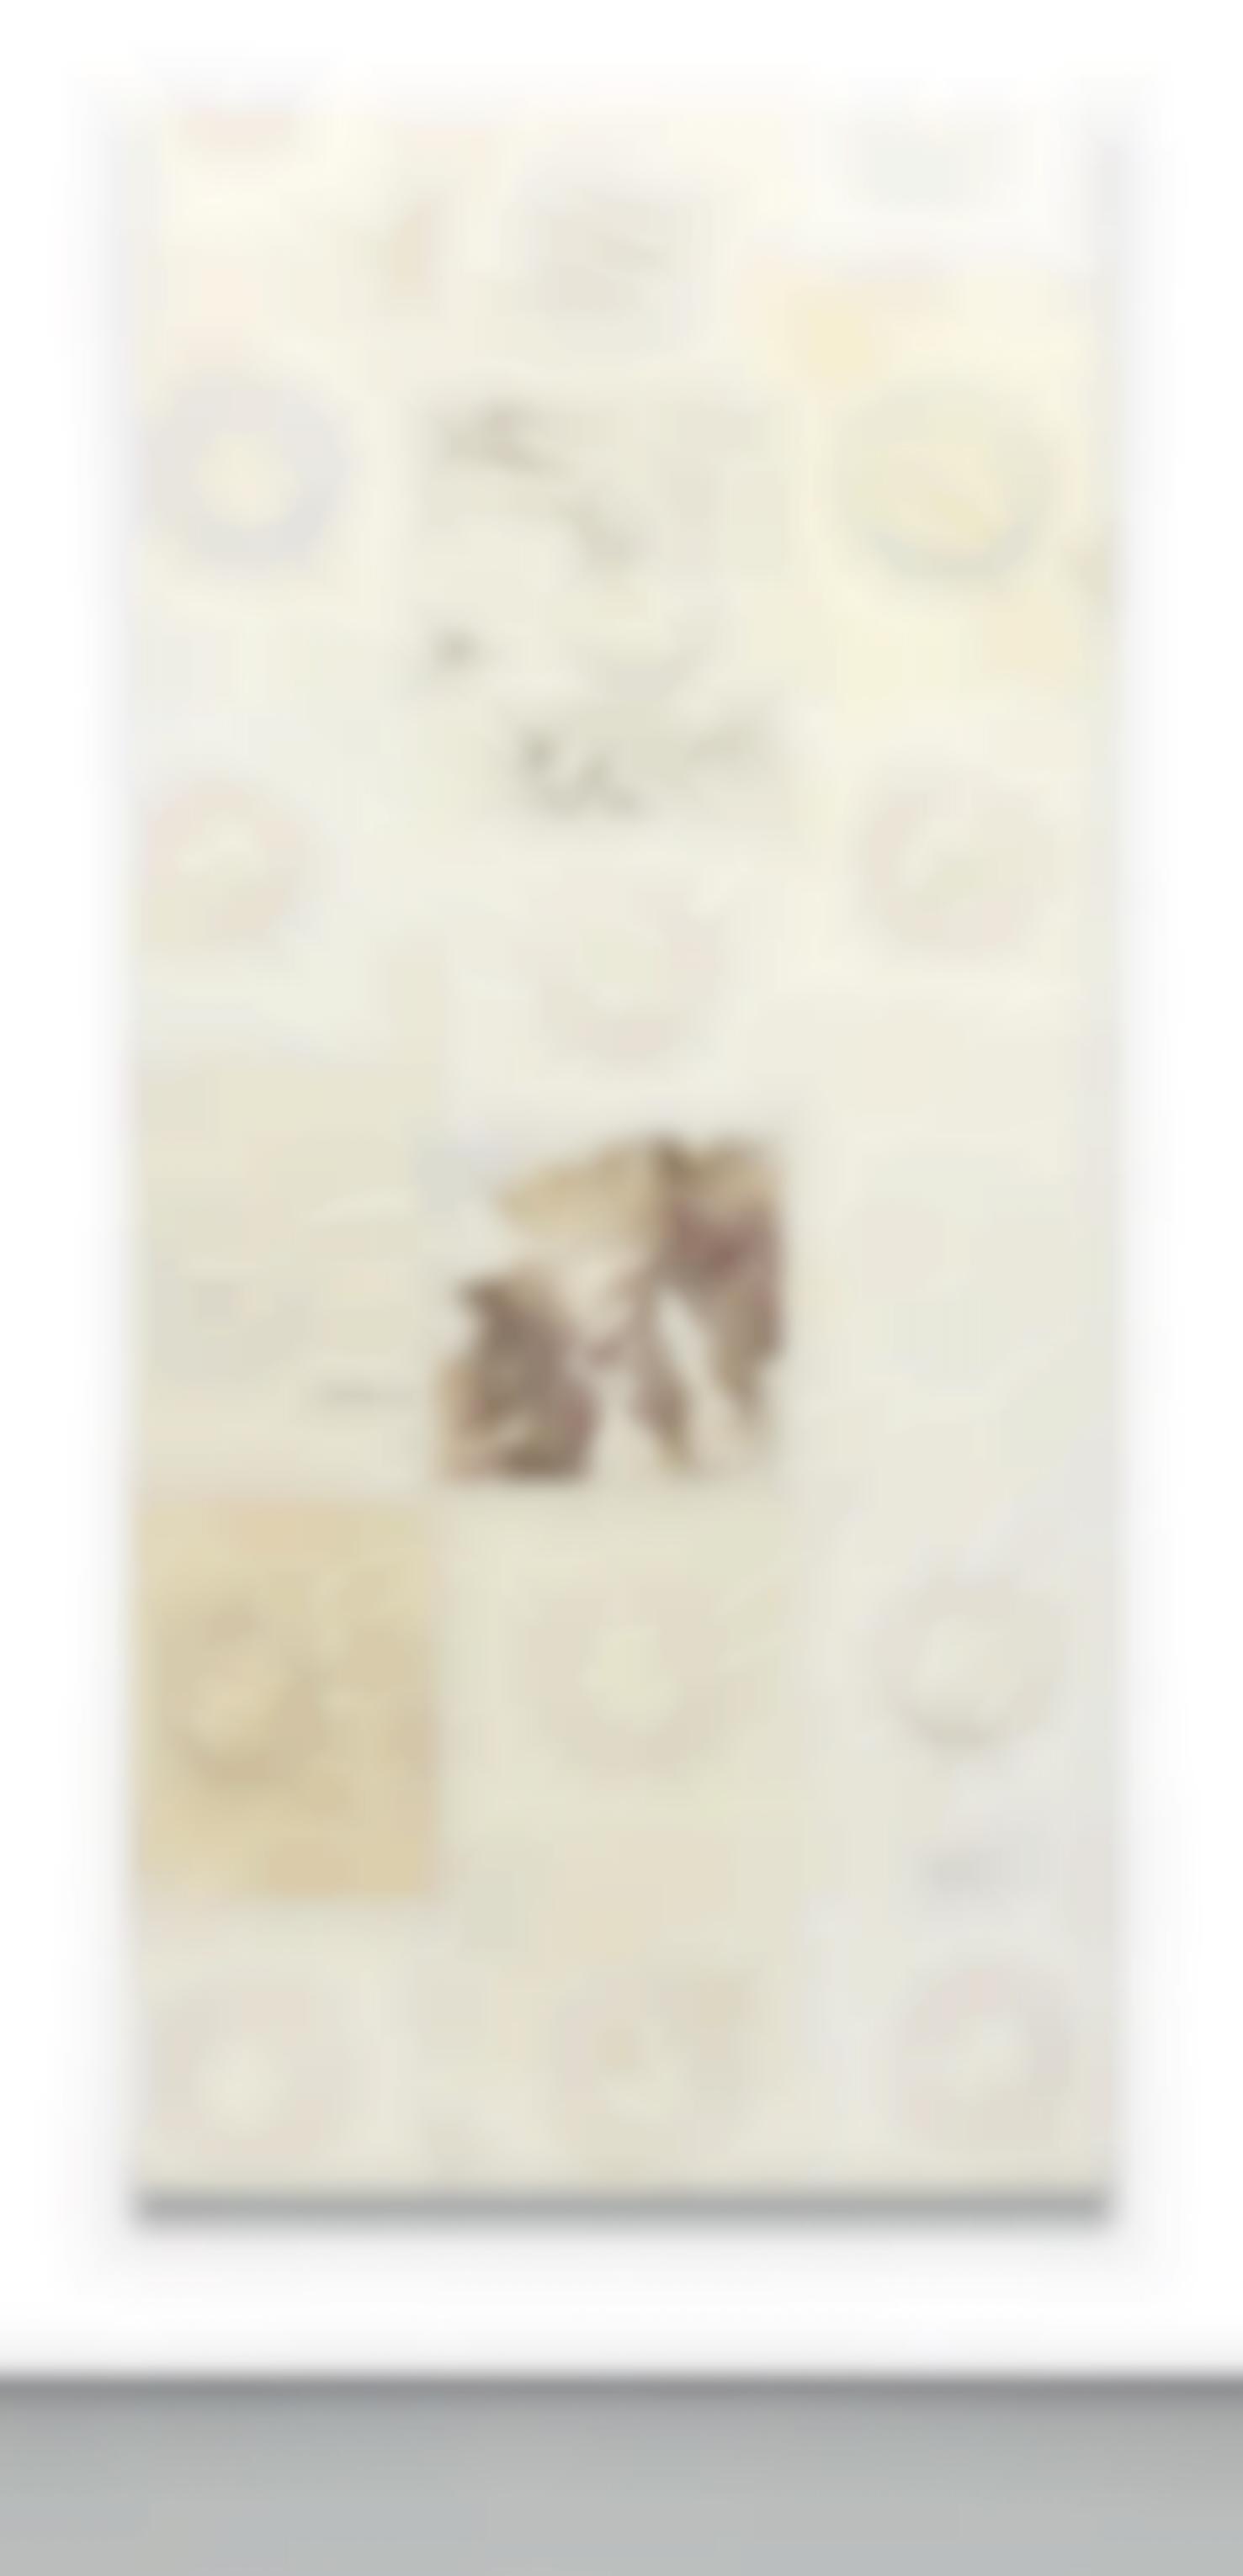 Ross Iannatti-Hysteresis no. 46-2013